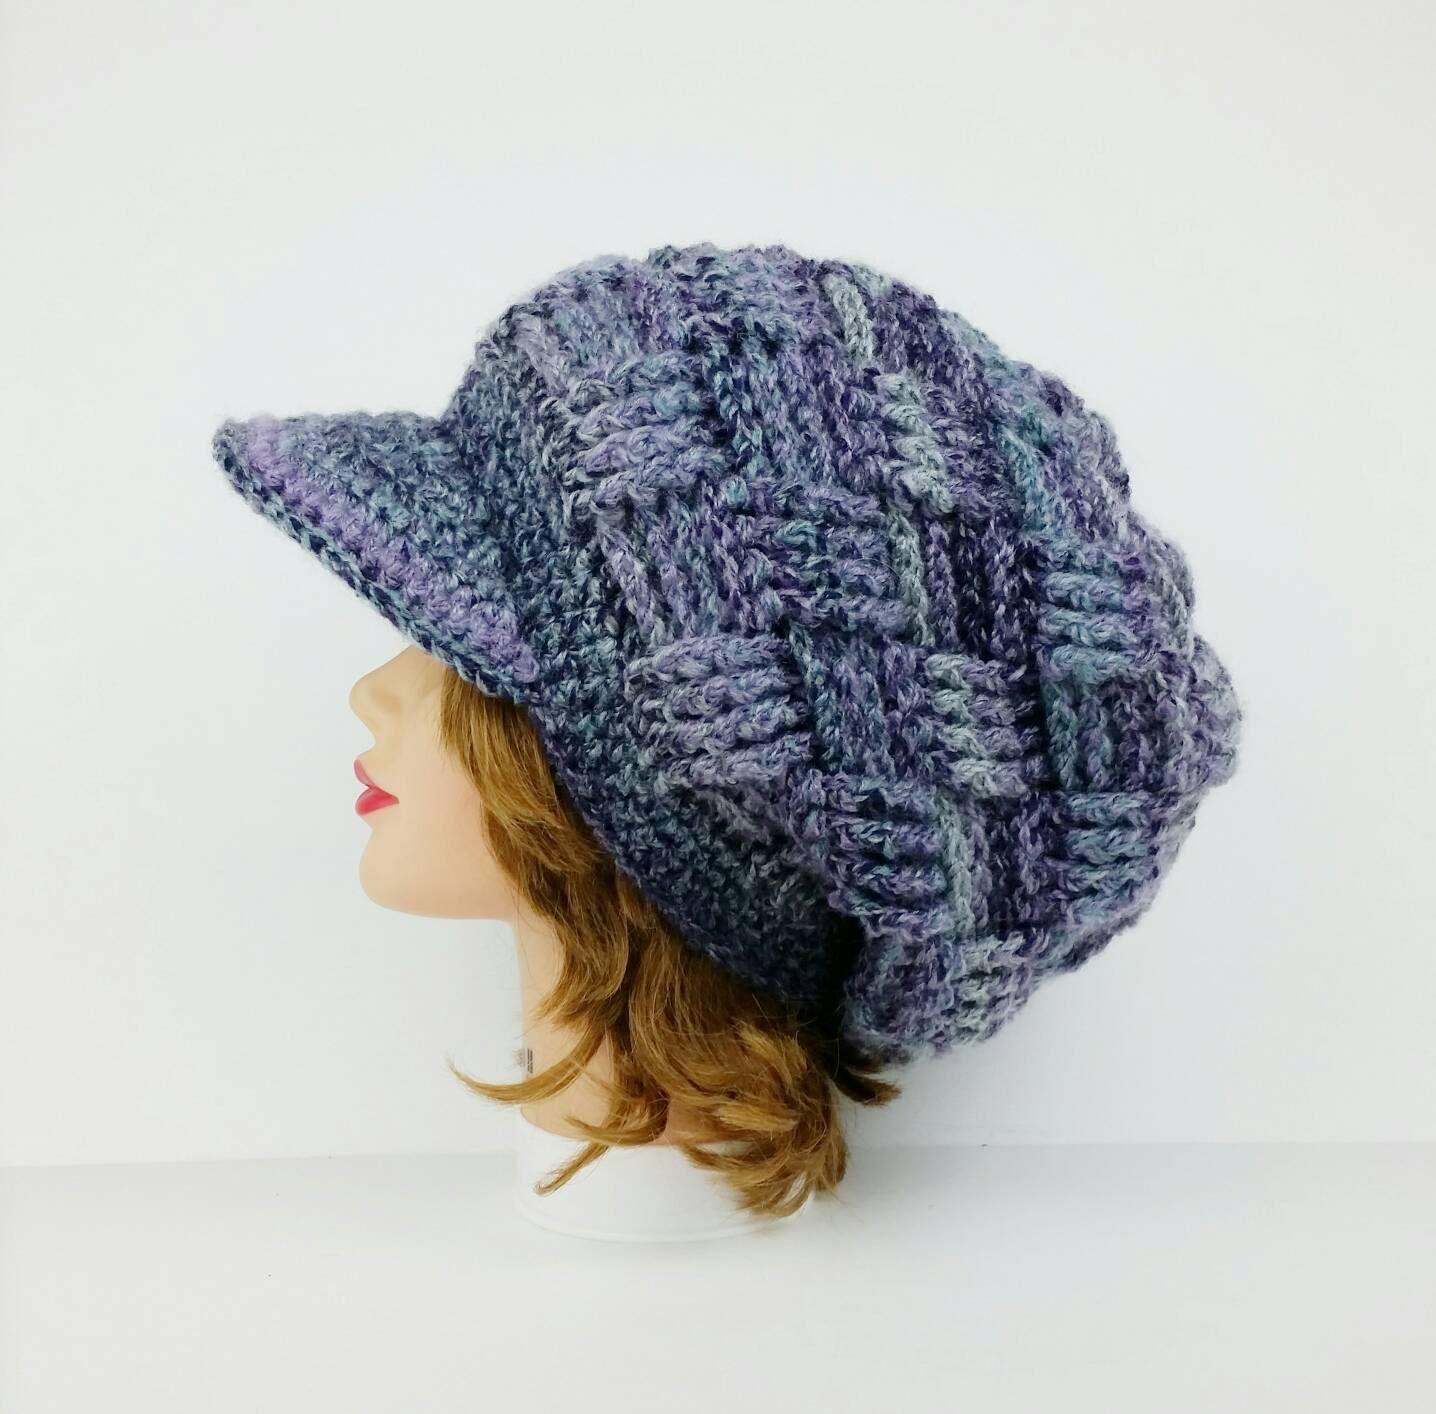 Slouchy Crochet Hat Newsboy Hat Women S Visor Beanie Etsy Crochet Newsboy Hat News Boy Hat Beanie Hats For Women